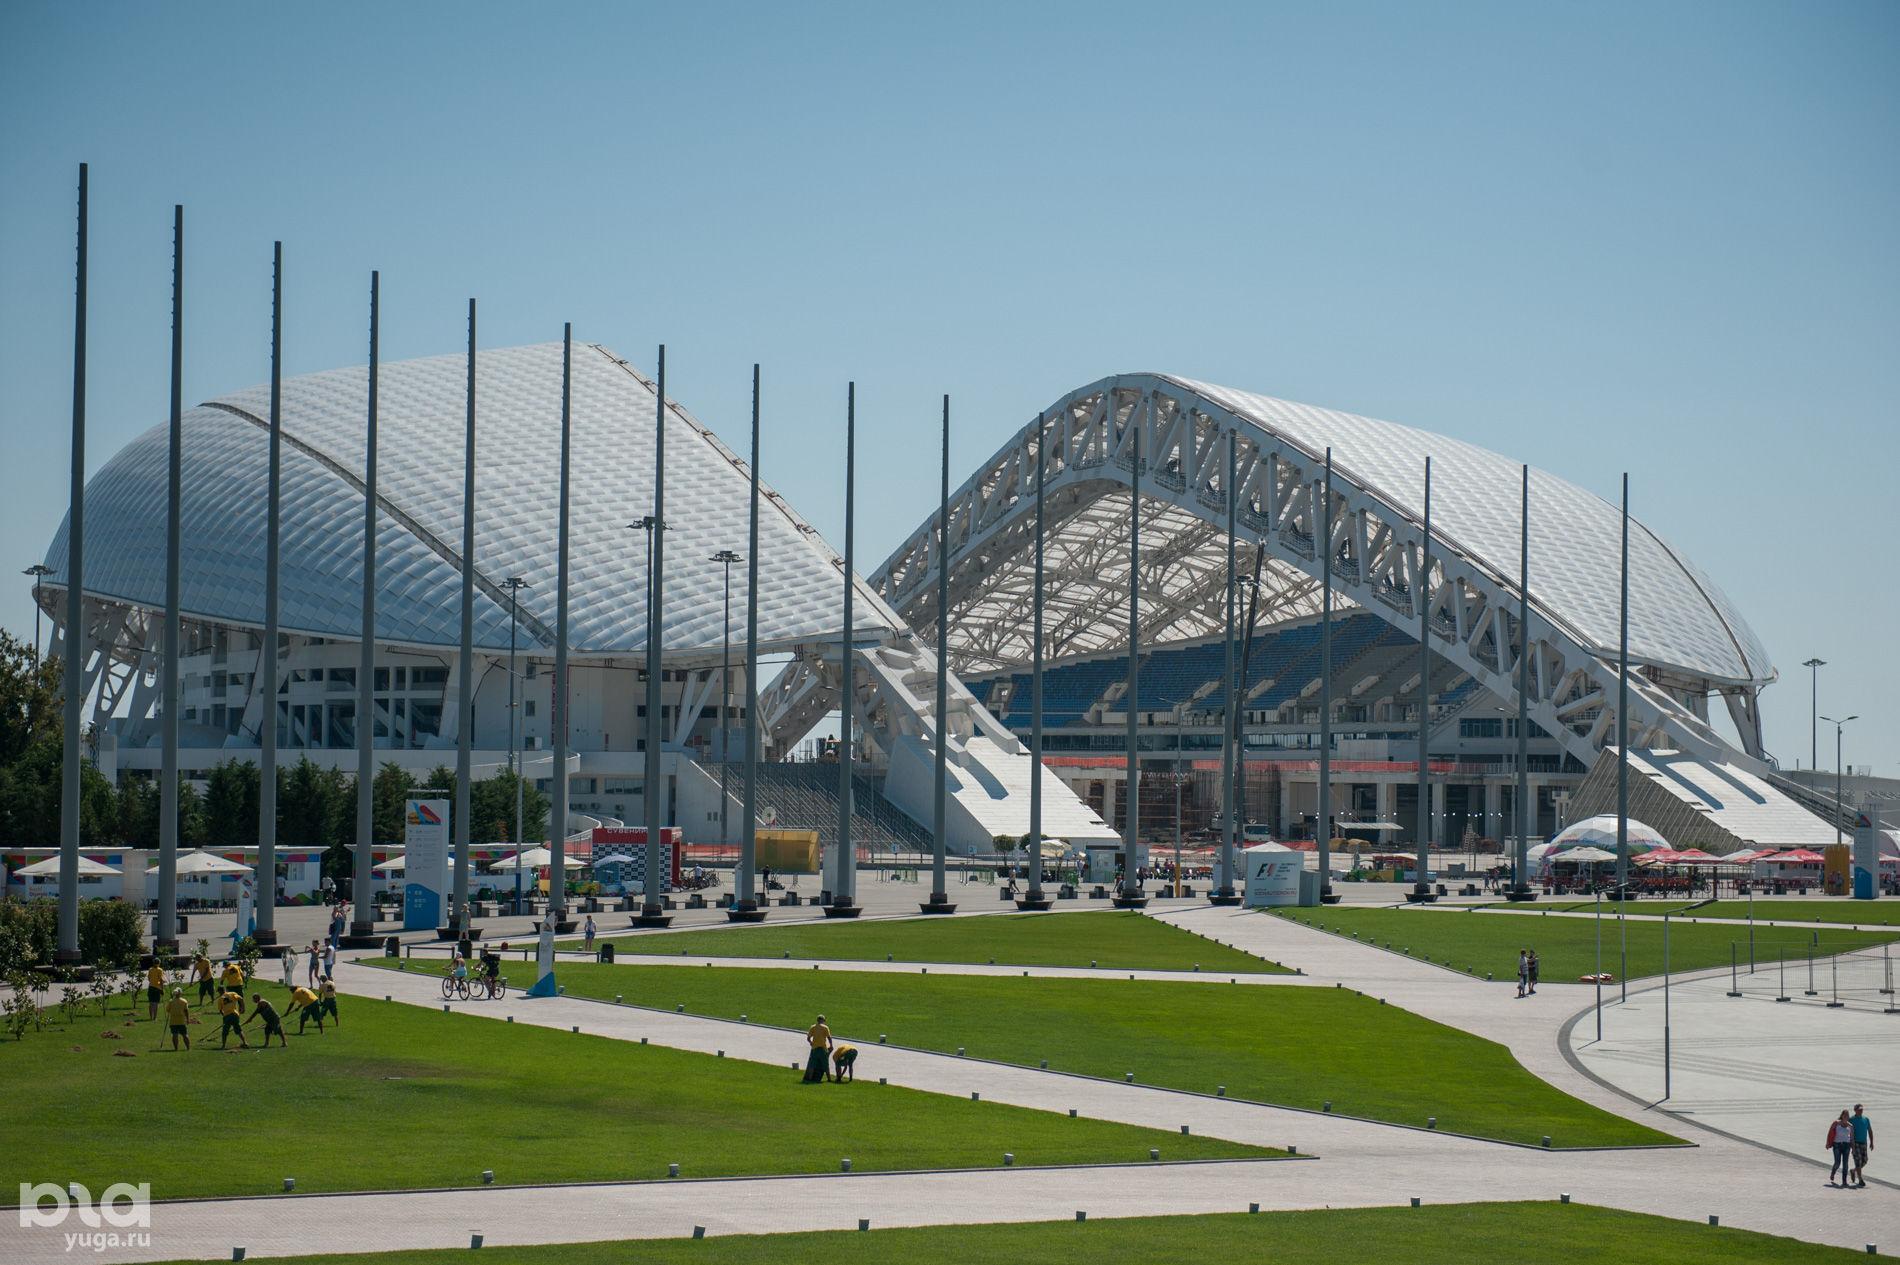 Стадион «Фишт» в Олимпийском парке в Сочи ©Юга.ру